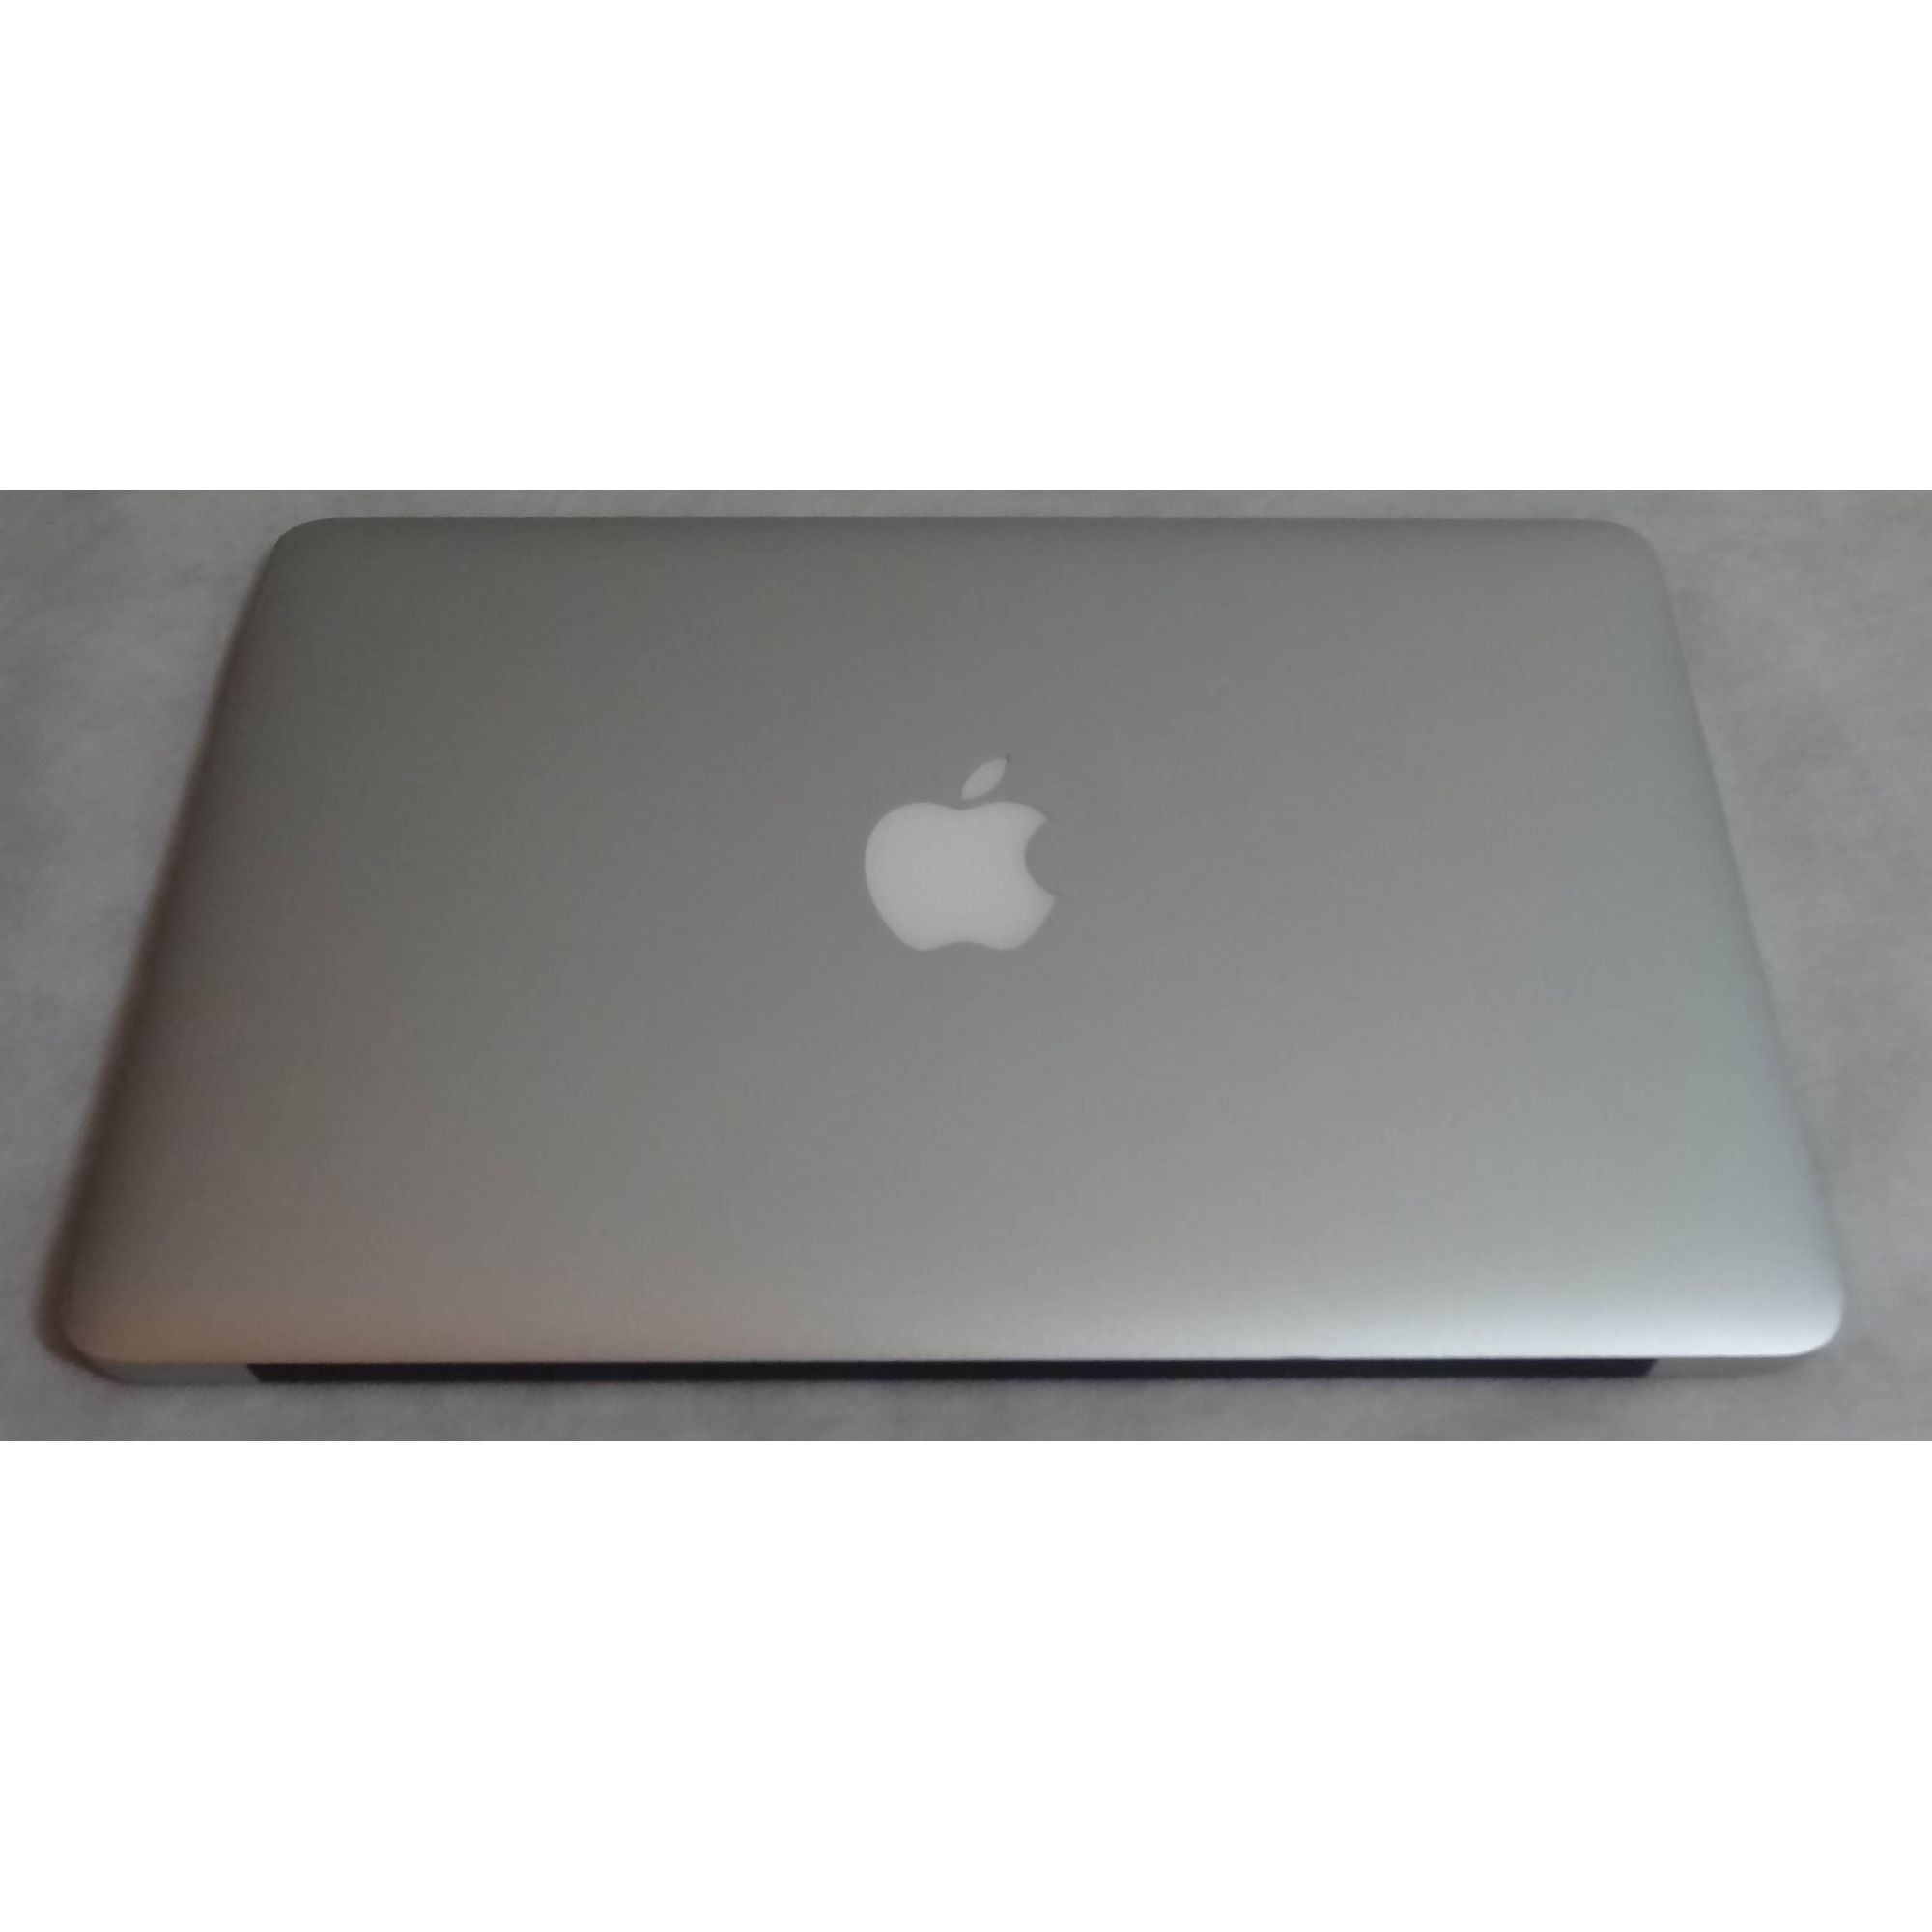 "MacBook Air MC505LL/A 11.6"" Intel Core 2 Duo 1.4GHz 2GB 64GB SSD(Não Enviamos)"